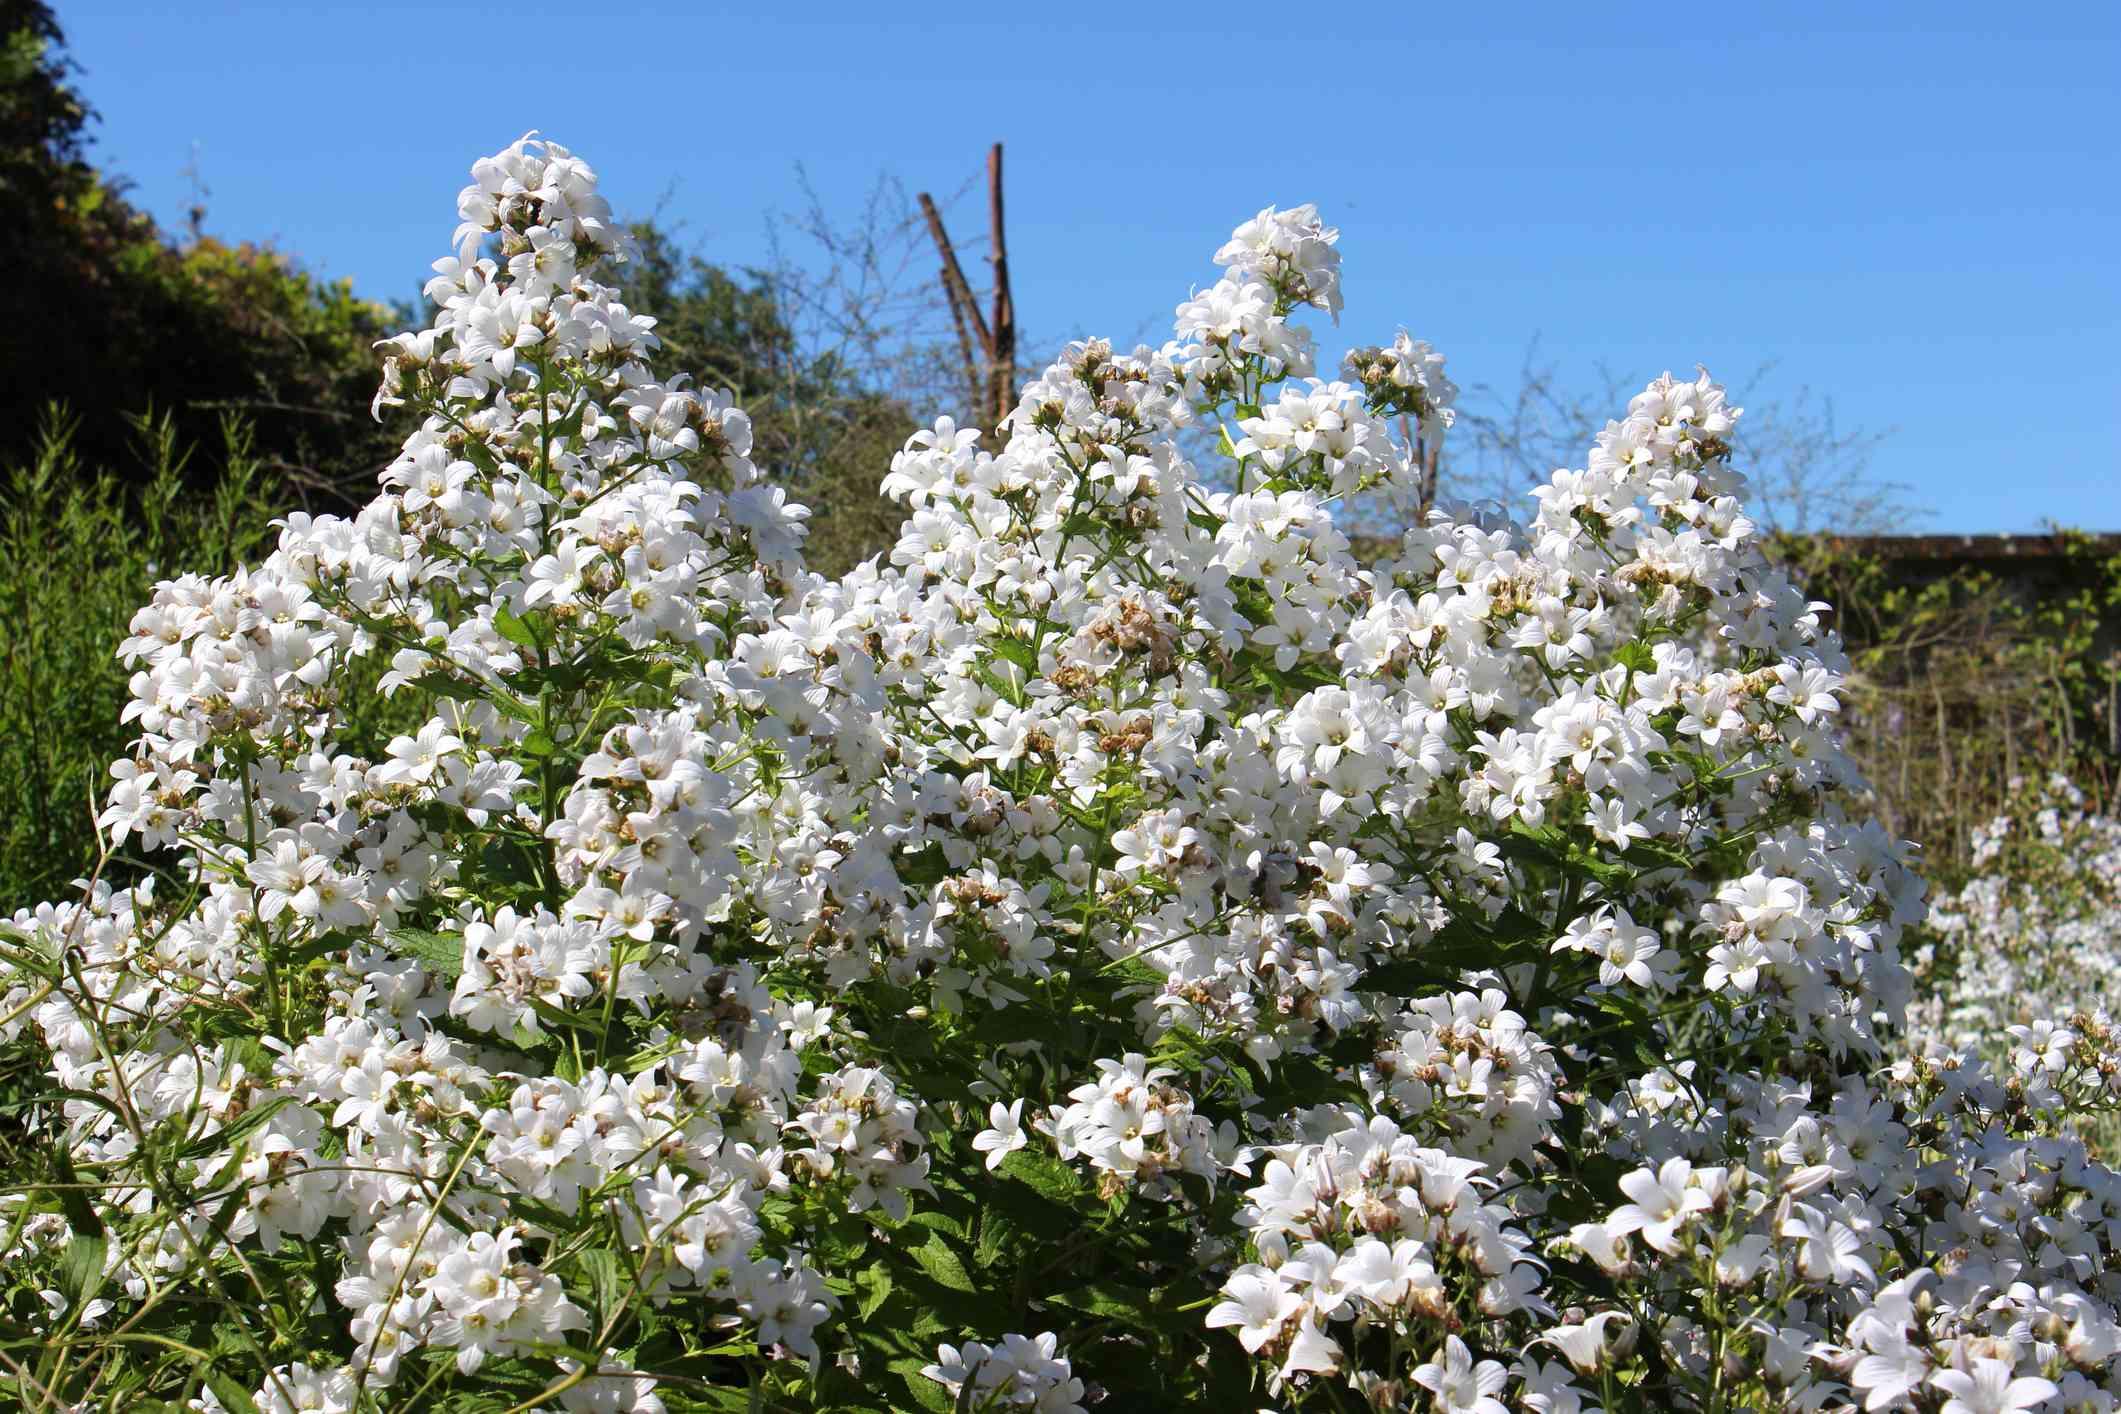 white Phlox paniculata 'David' blooming in a field under a blue sky